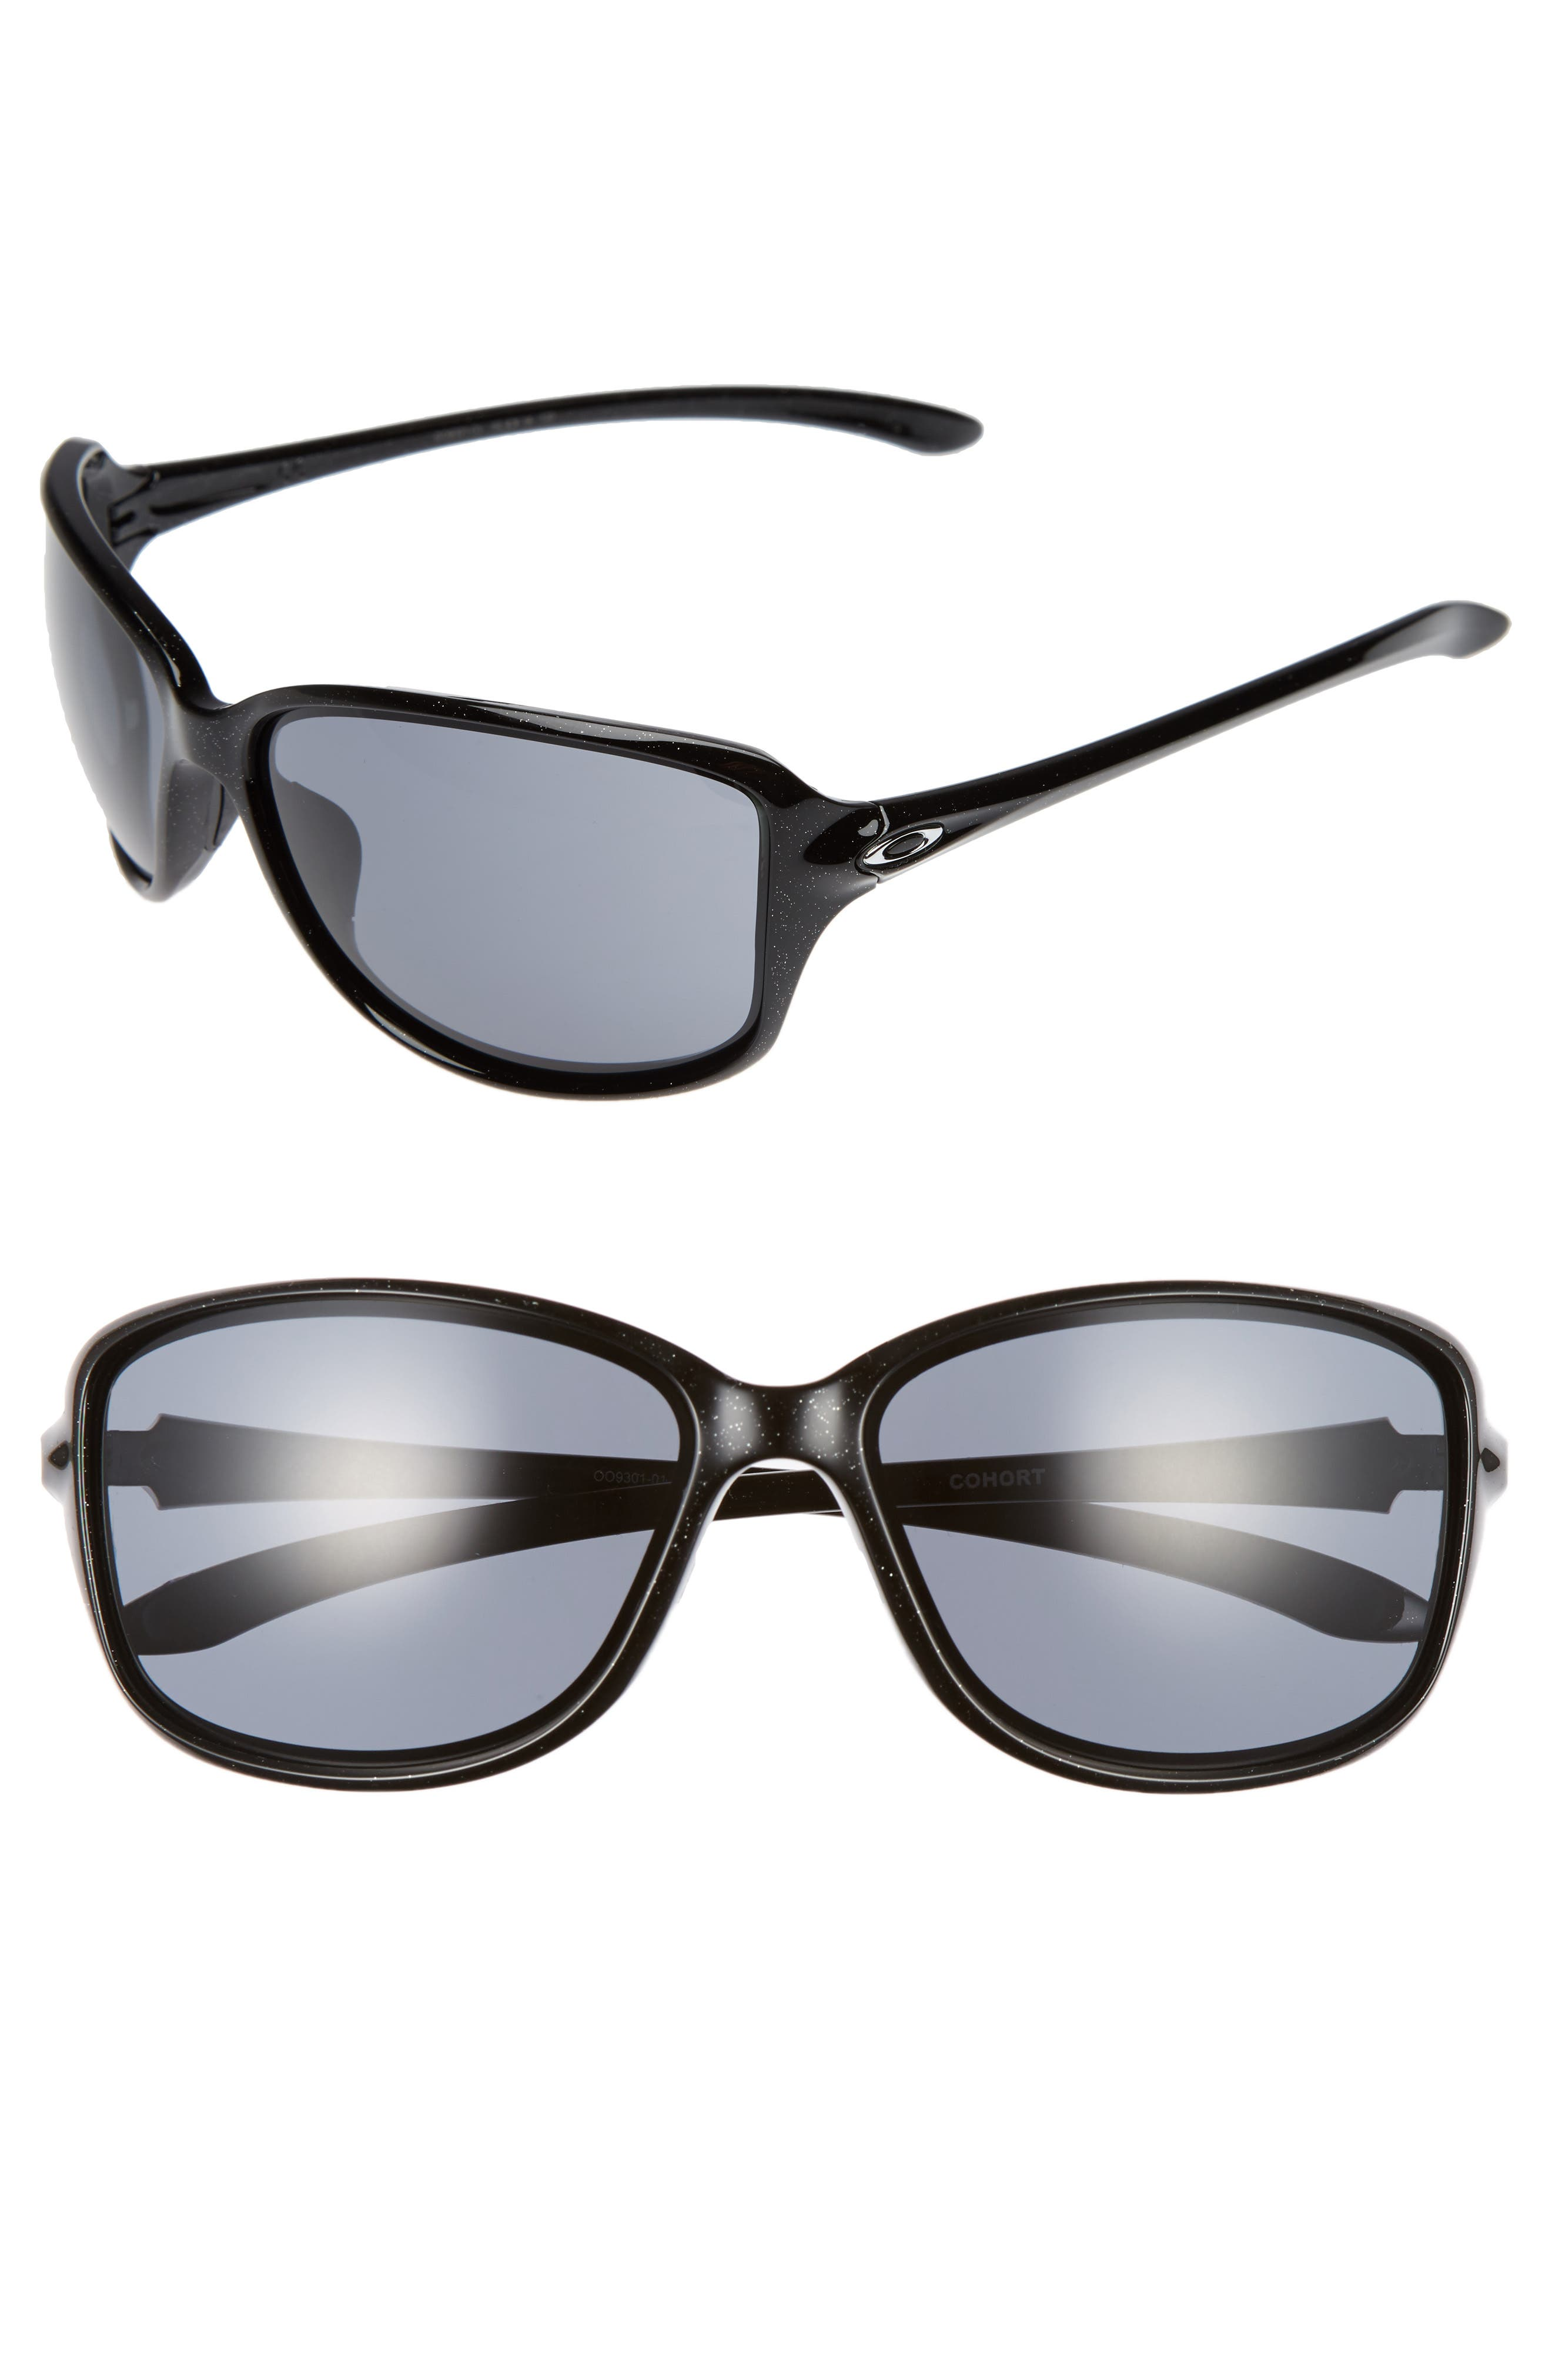 Cohort 62mm Sunglasses,                         Main,                         color,